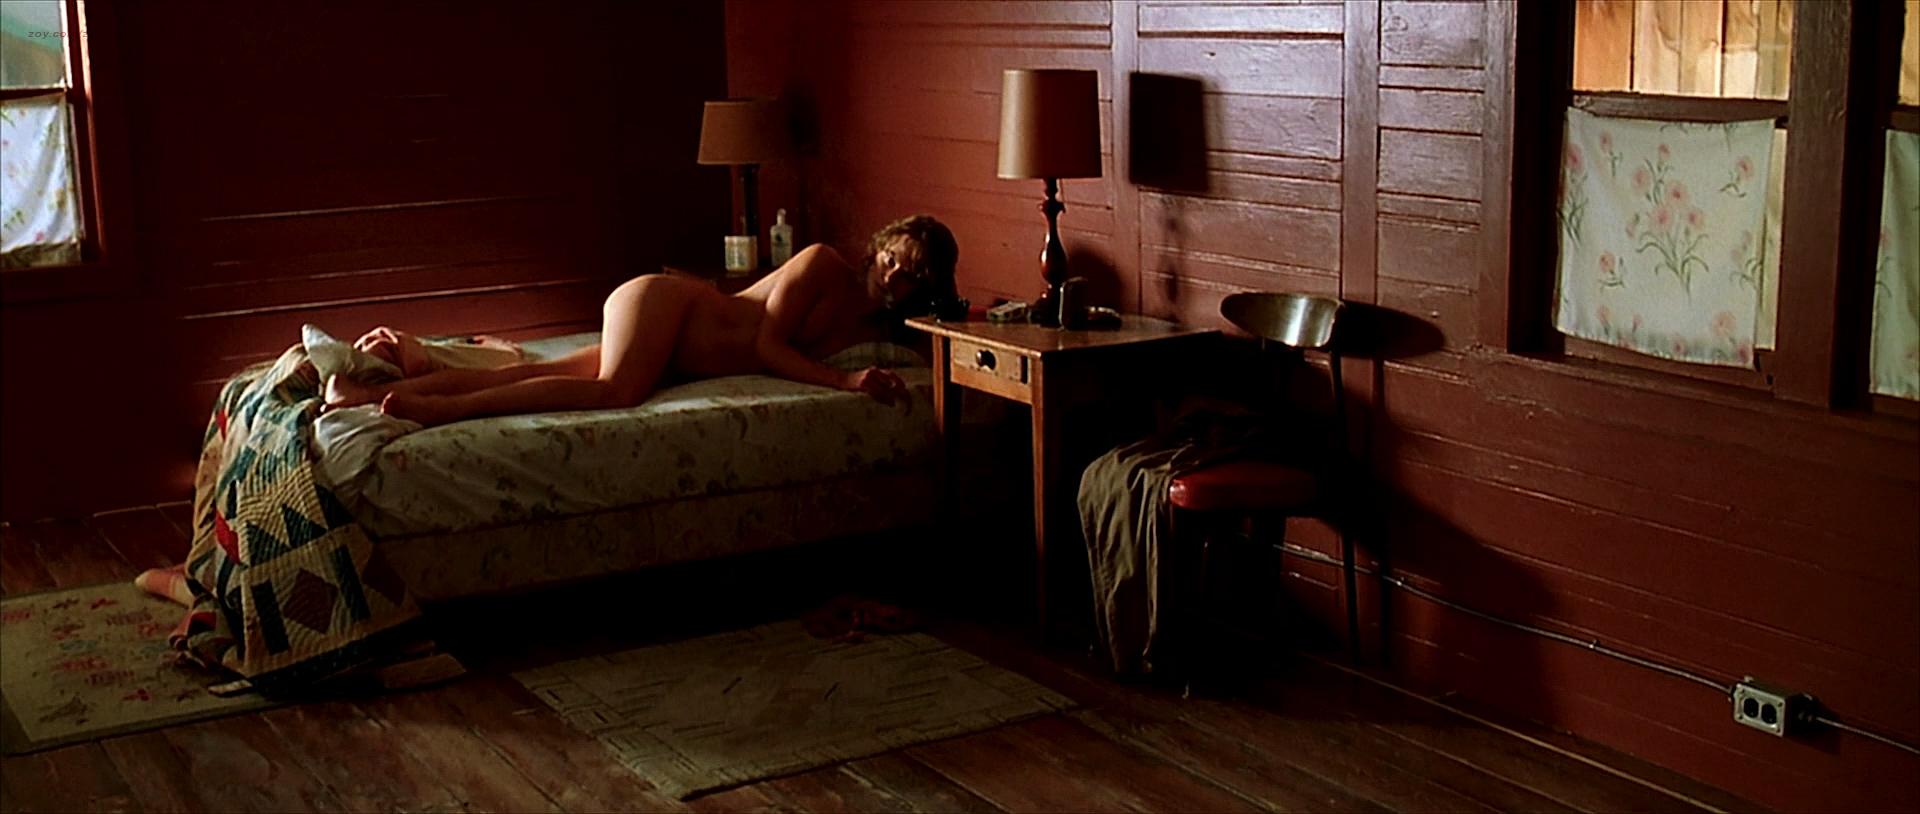 Nicole Kidman sexy hot and Jacinda Barrett nude bush and boobs- The Human Stain (2003) HD 1080p BluRay (9)